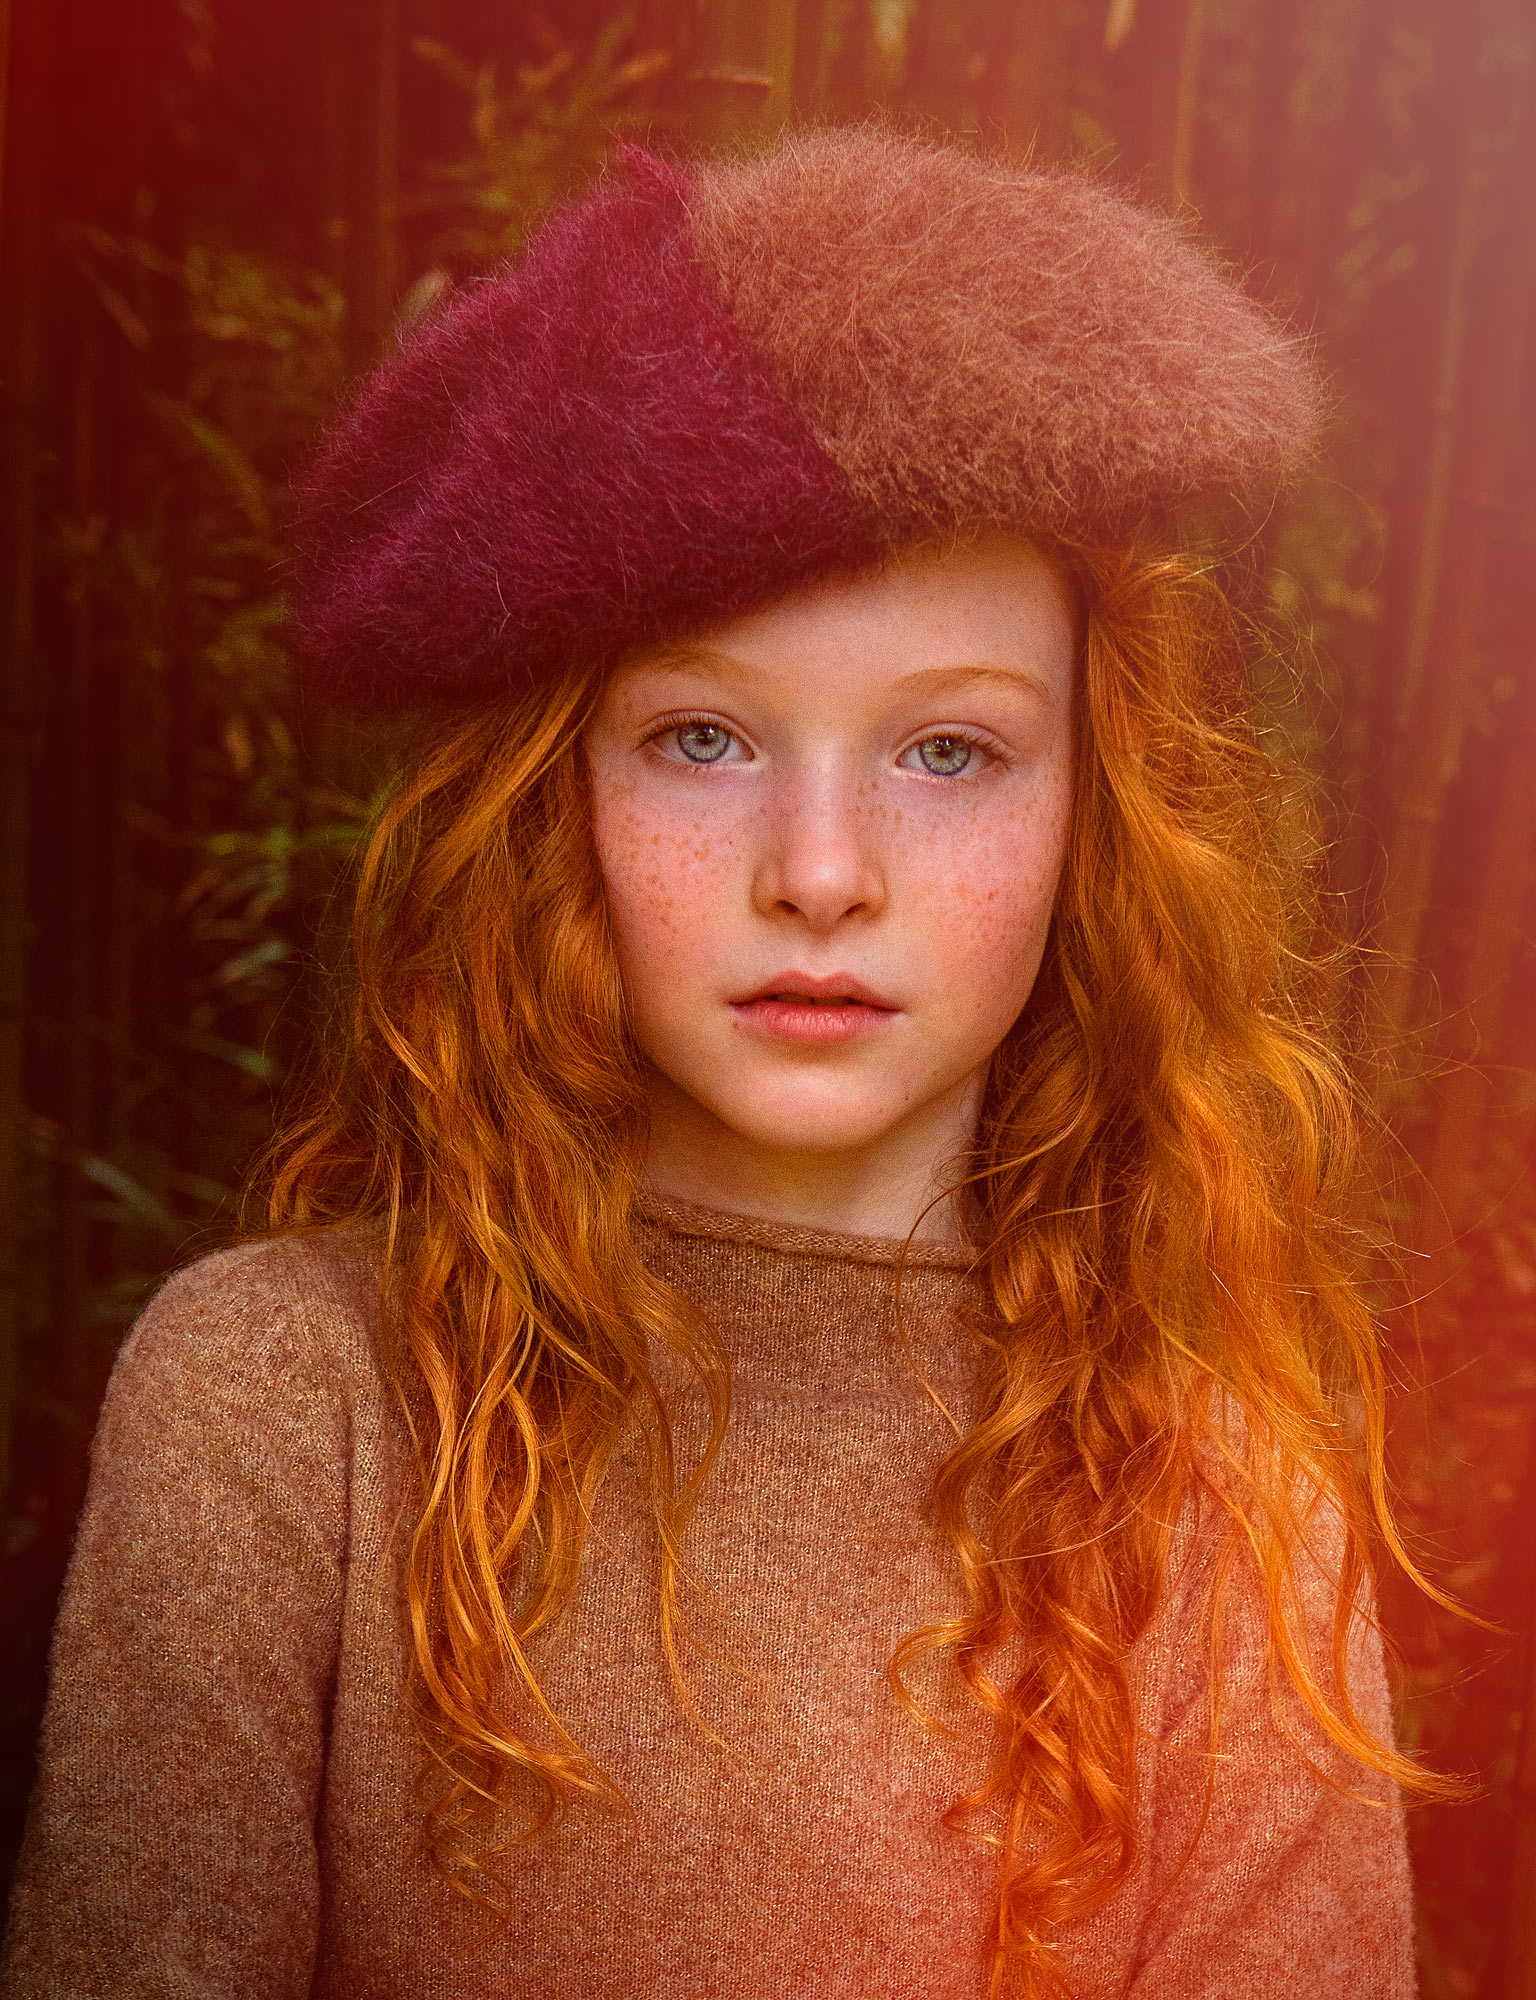 Takashimaya - Karolina Henke / skarp photography